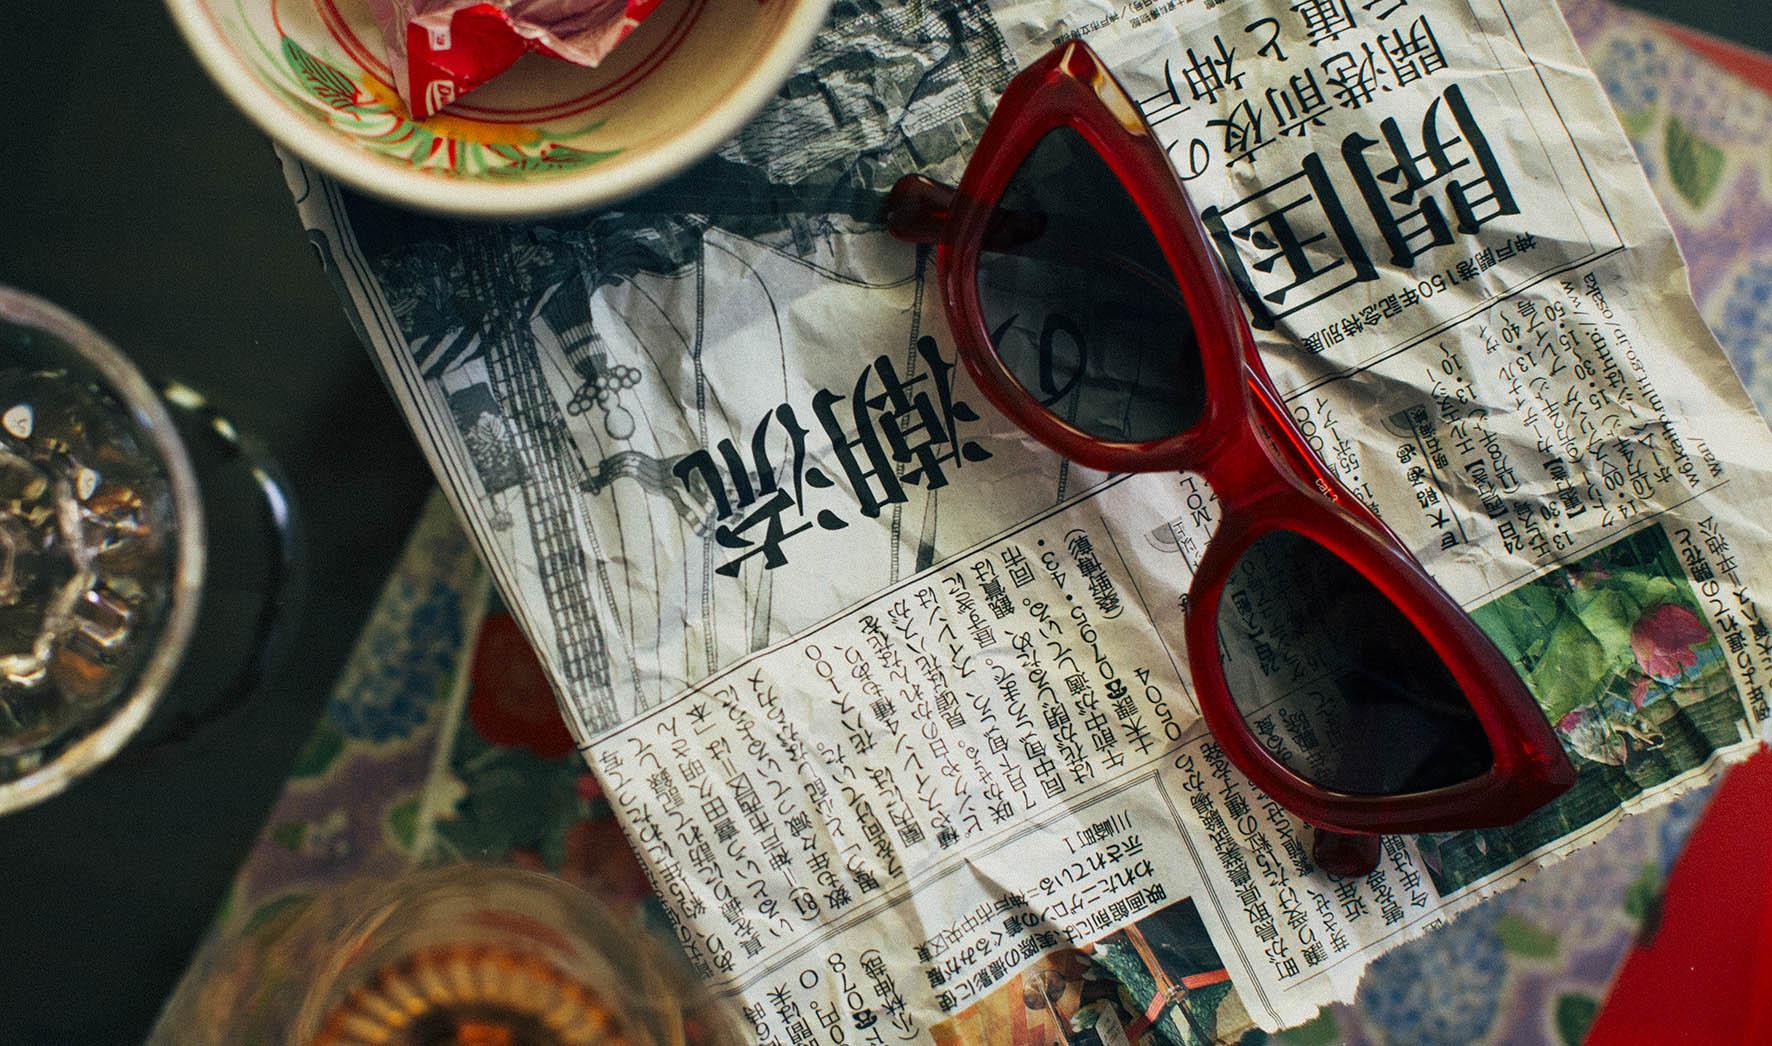 ss19 - Kokoro Red - Folc eyewear - web.jpg